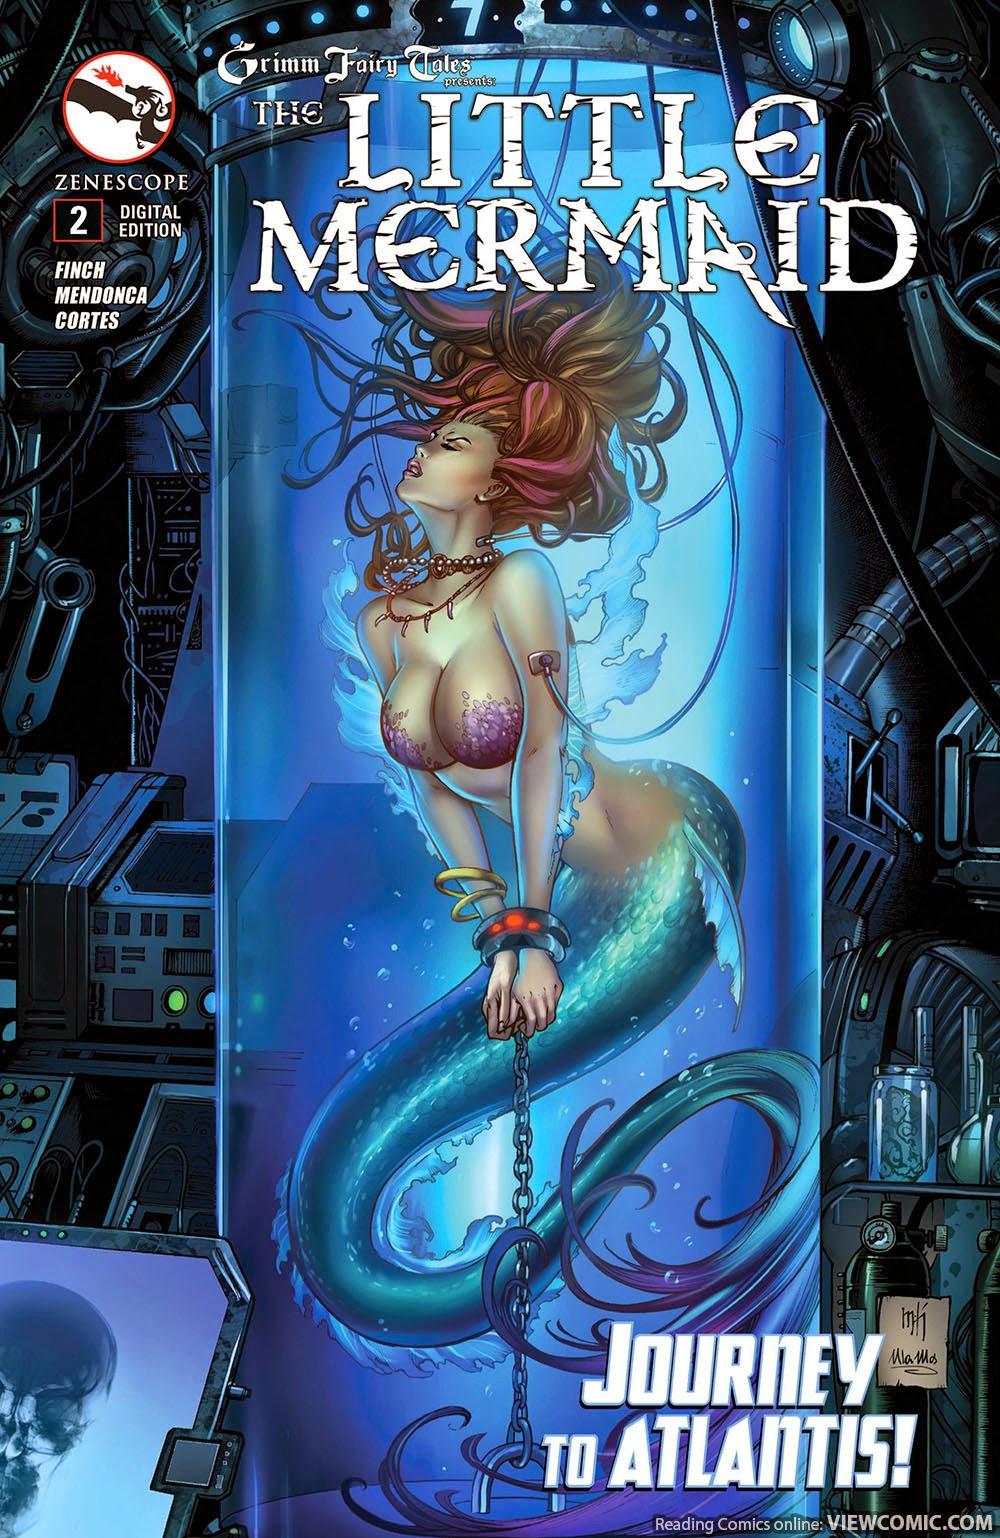 grimm fairy tales presents the little mermaid 002 (2015) | viewcomic